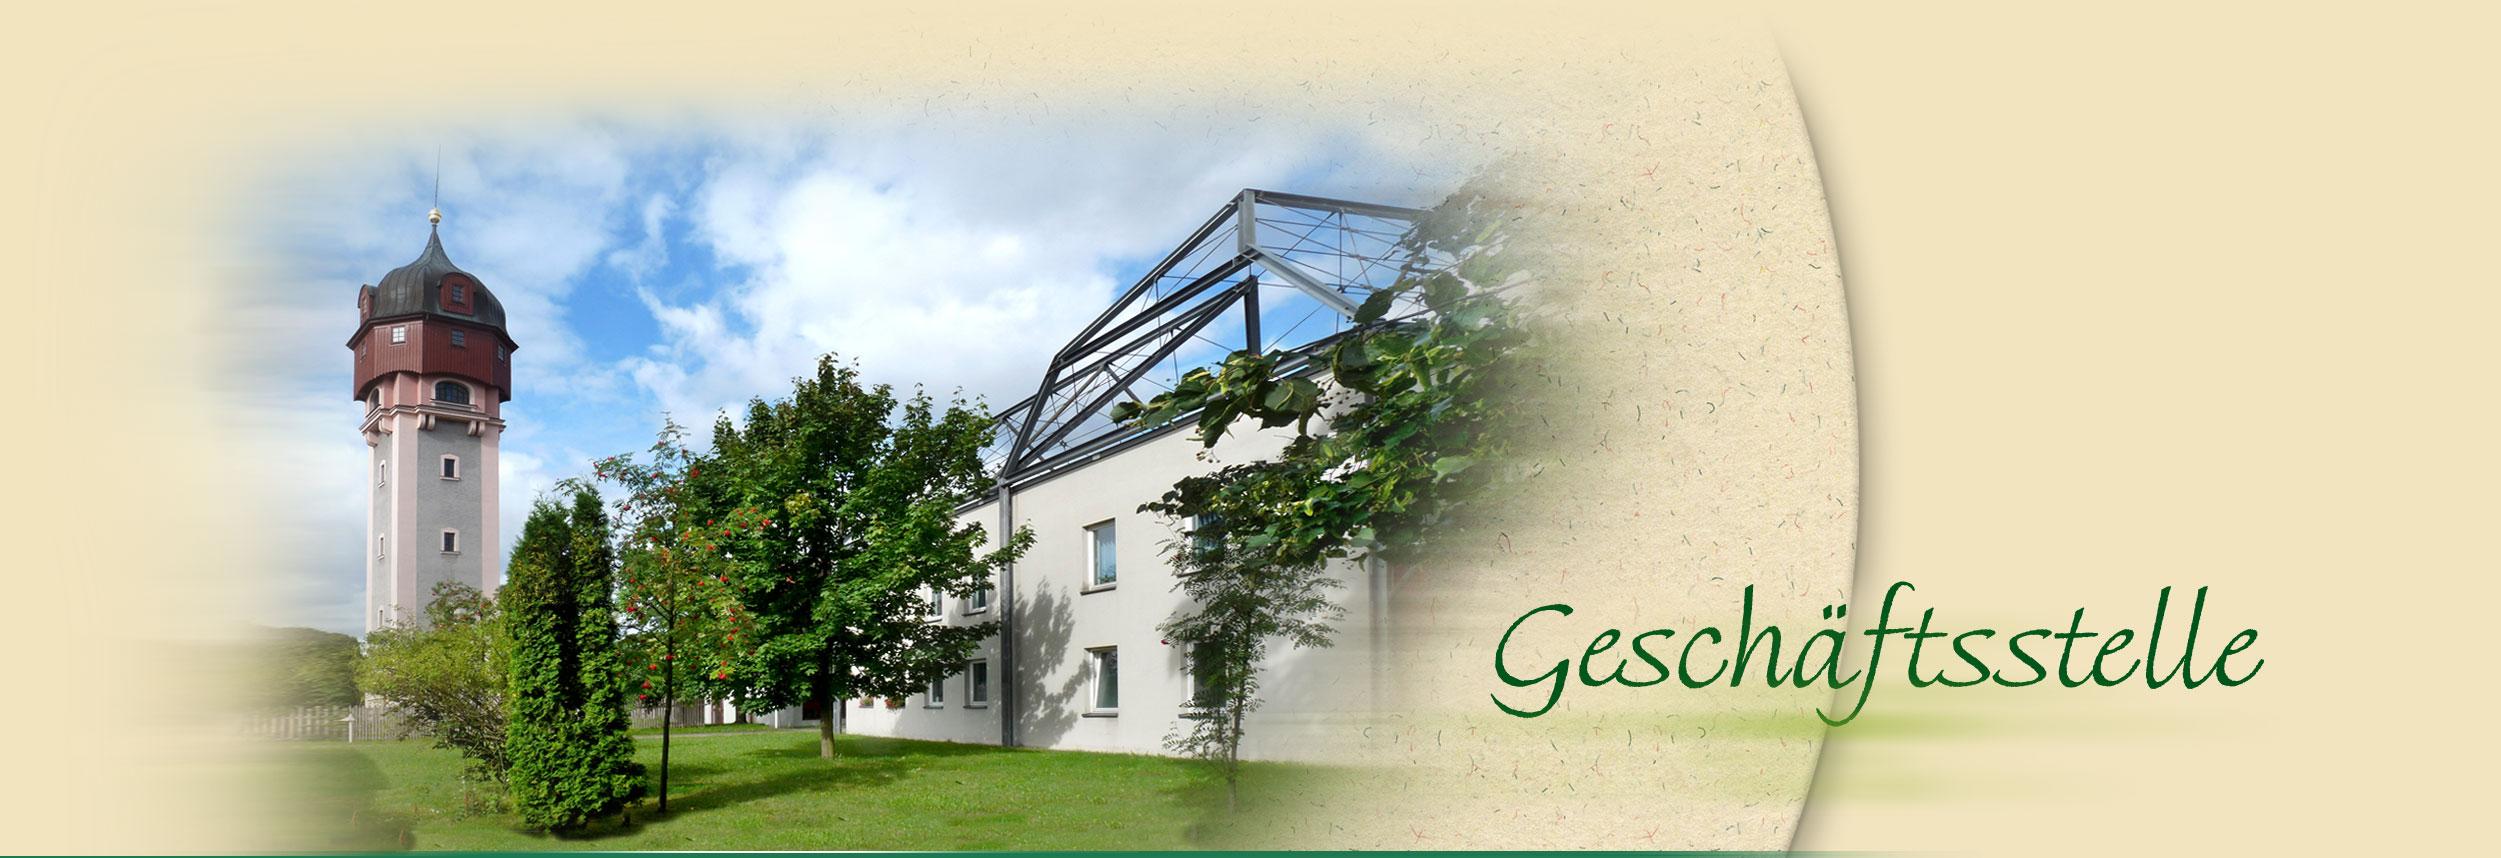 Geschäftsstelle Seniorenheime Freiberg gGmbH